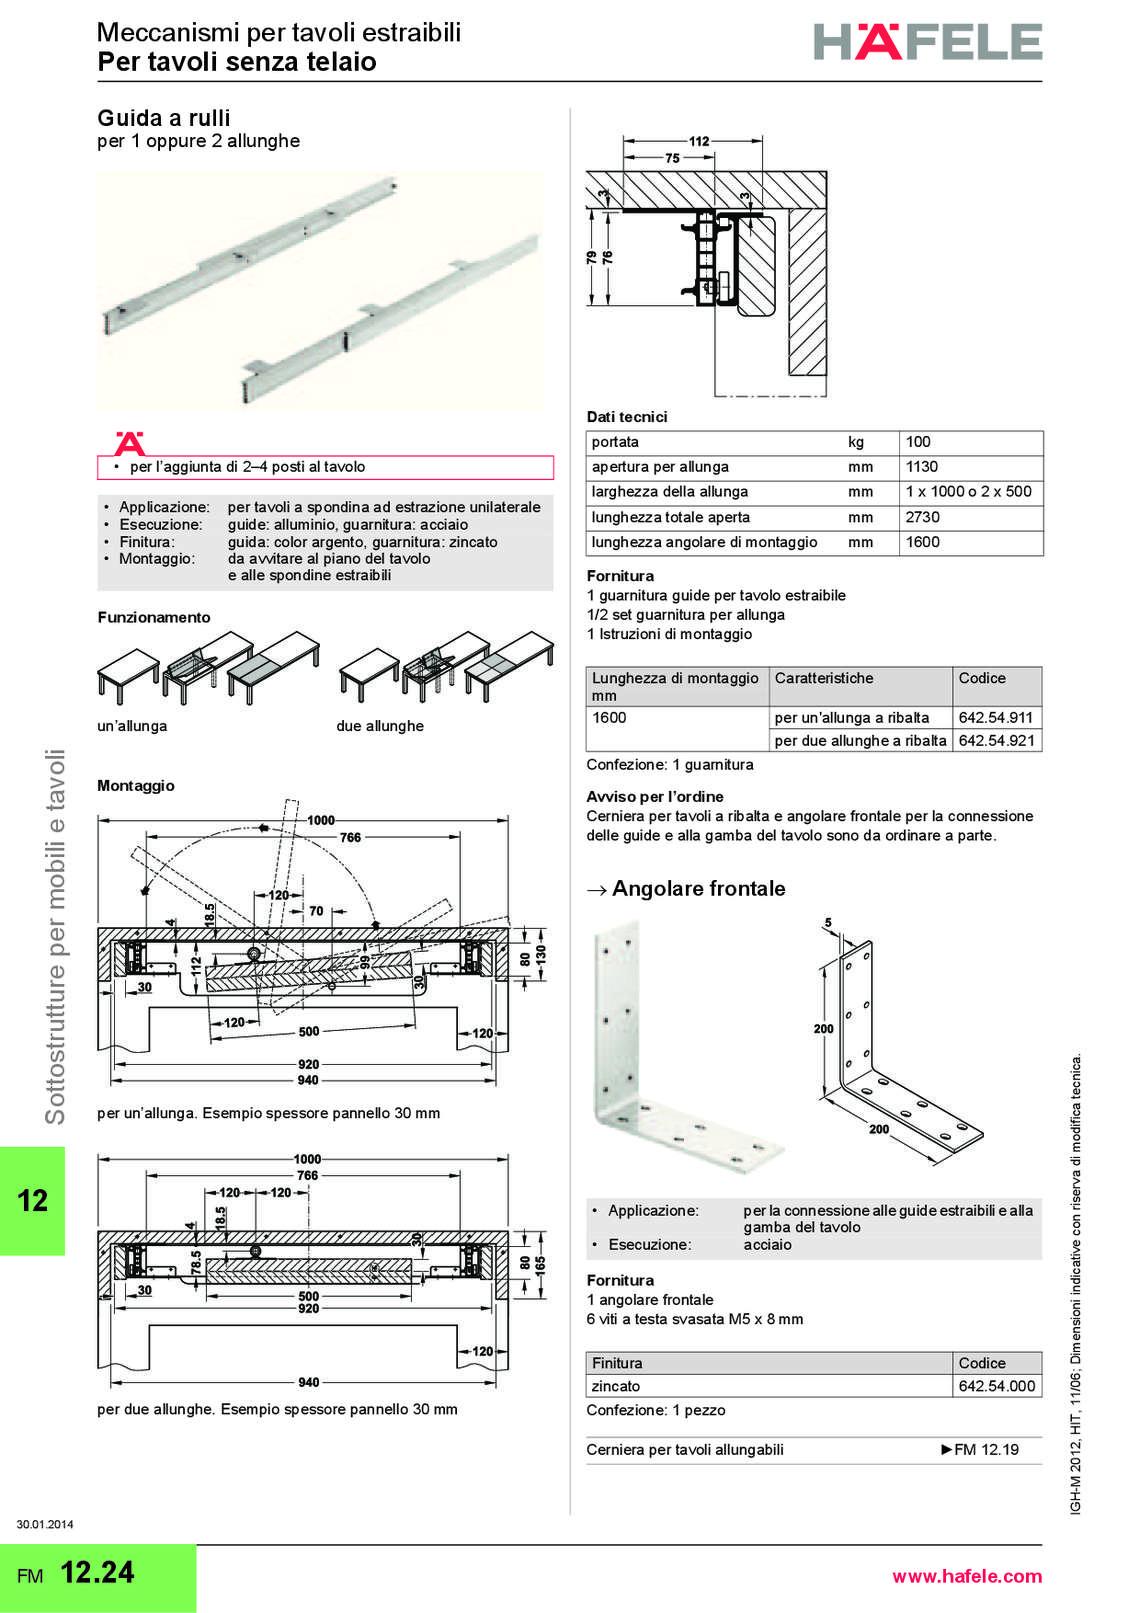 hafele-sottostrutture-per-mobili_83_039.jpg